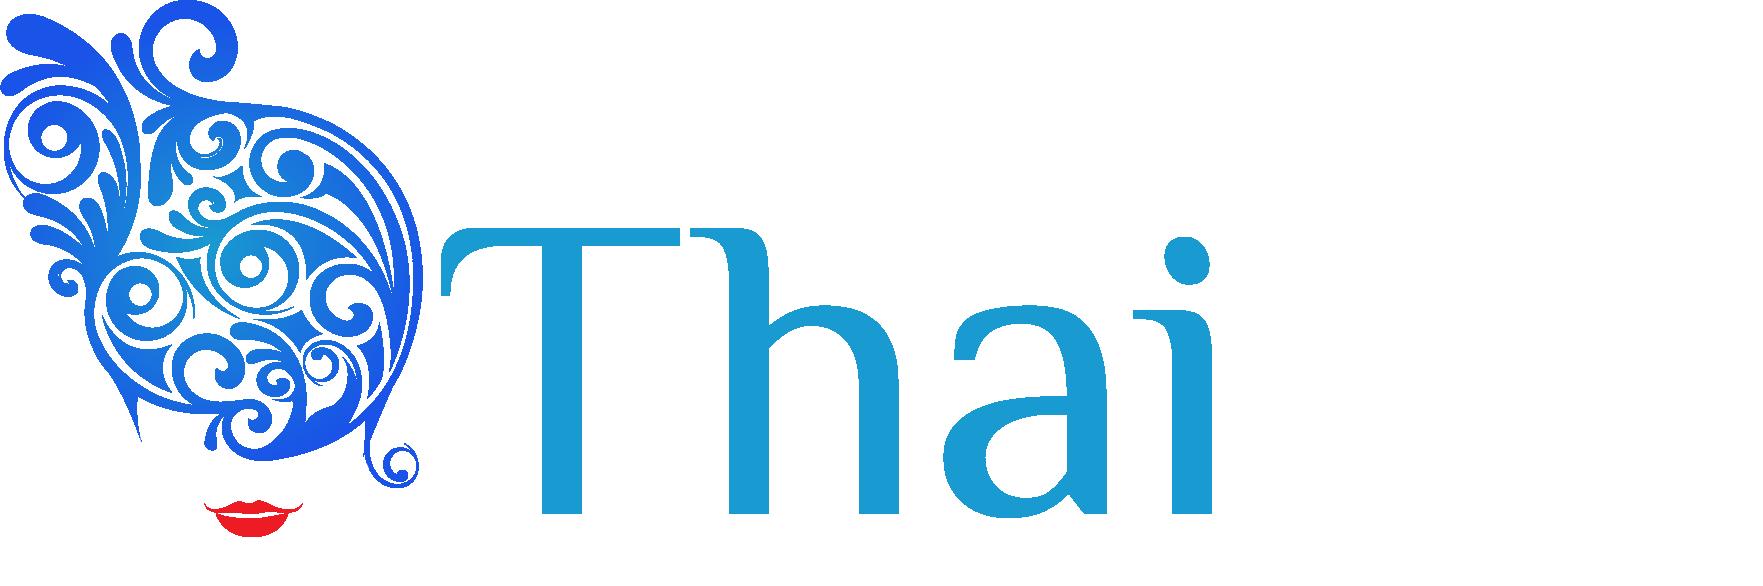 THAIGO